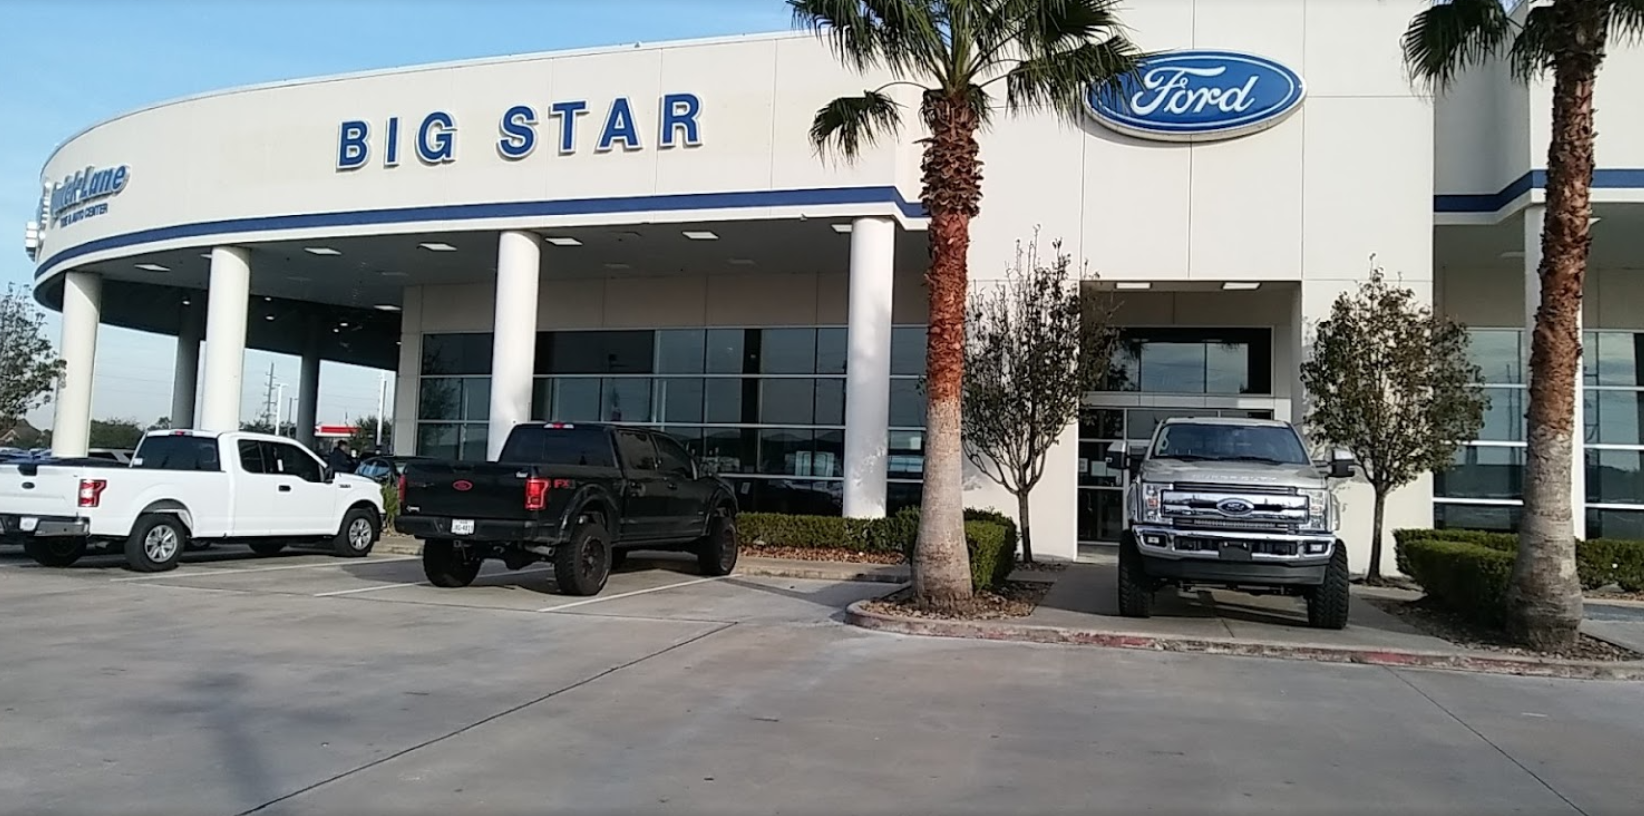 Big Star Ford Manvel Tx >> Big Star Ford in Manvel, TX 77578 - ChamberofCommerce.com